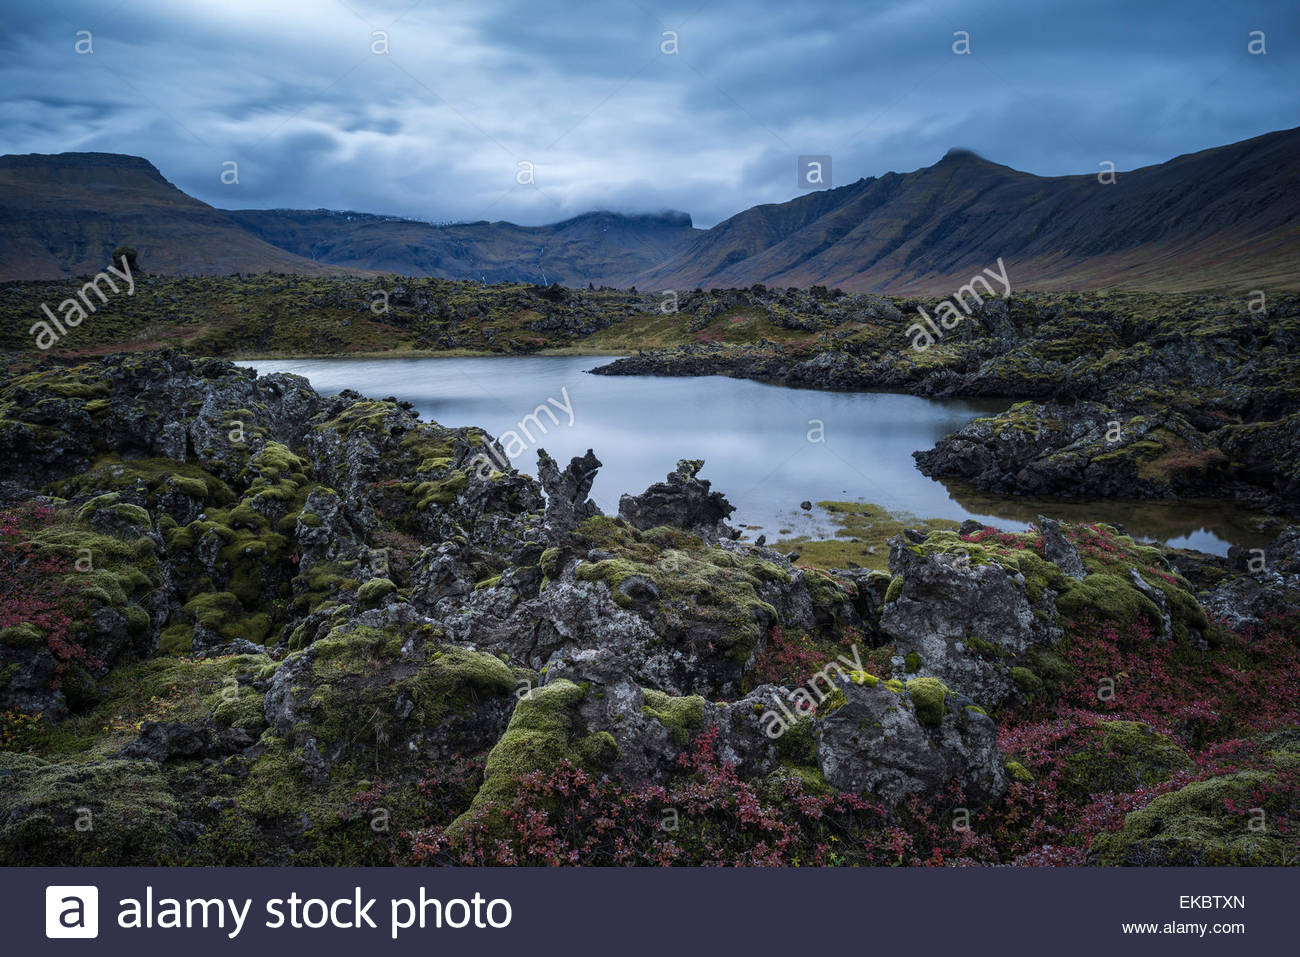 Teich im Lavafeld, Snaefellsnes Halbinsel, Island Stockbild